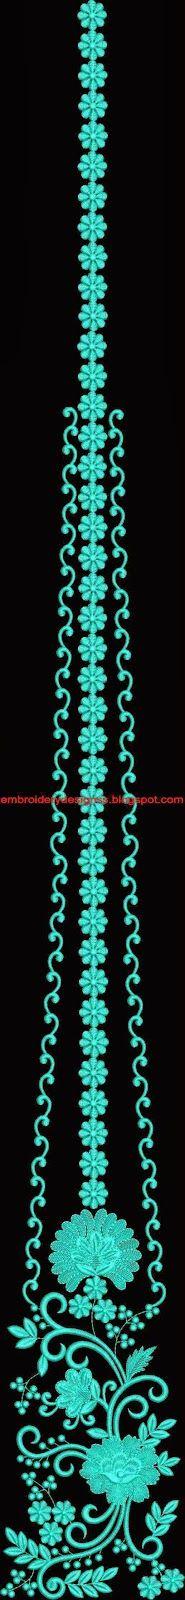 Embroidery Designs, Embroidery Designs, Embroidery Designs Free, New Embroidery Designs, Wilcom Embroidery Designs, Embroidery Designs C...